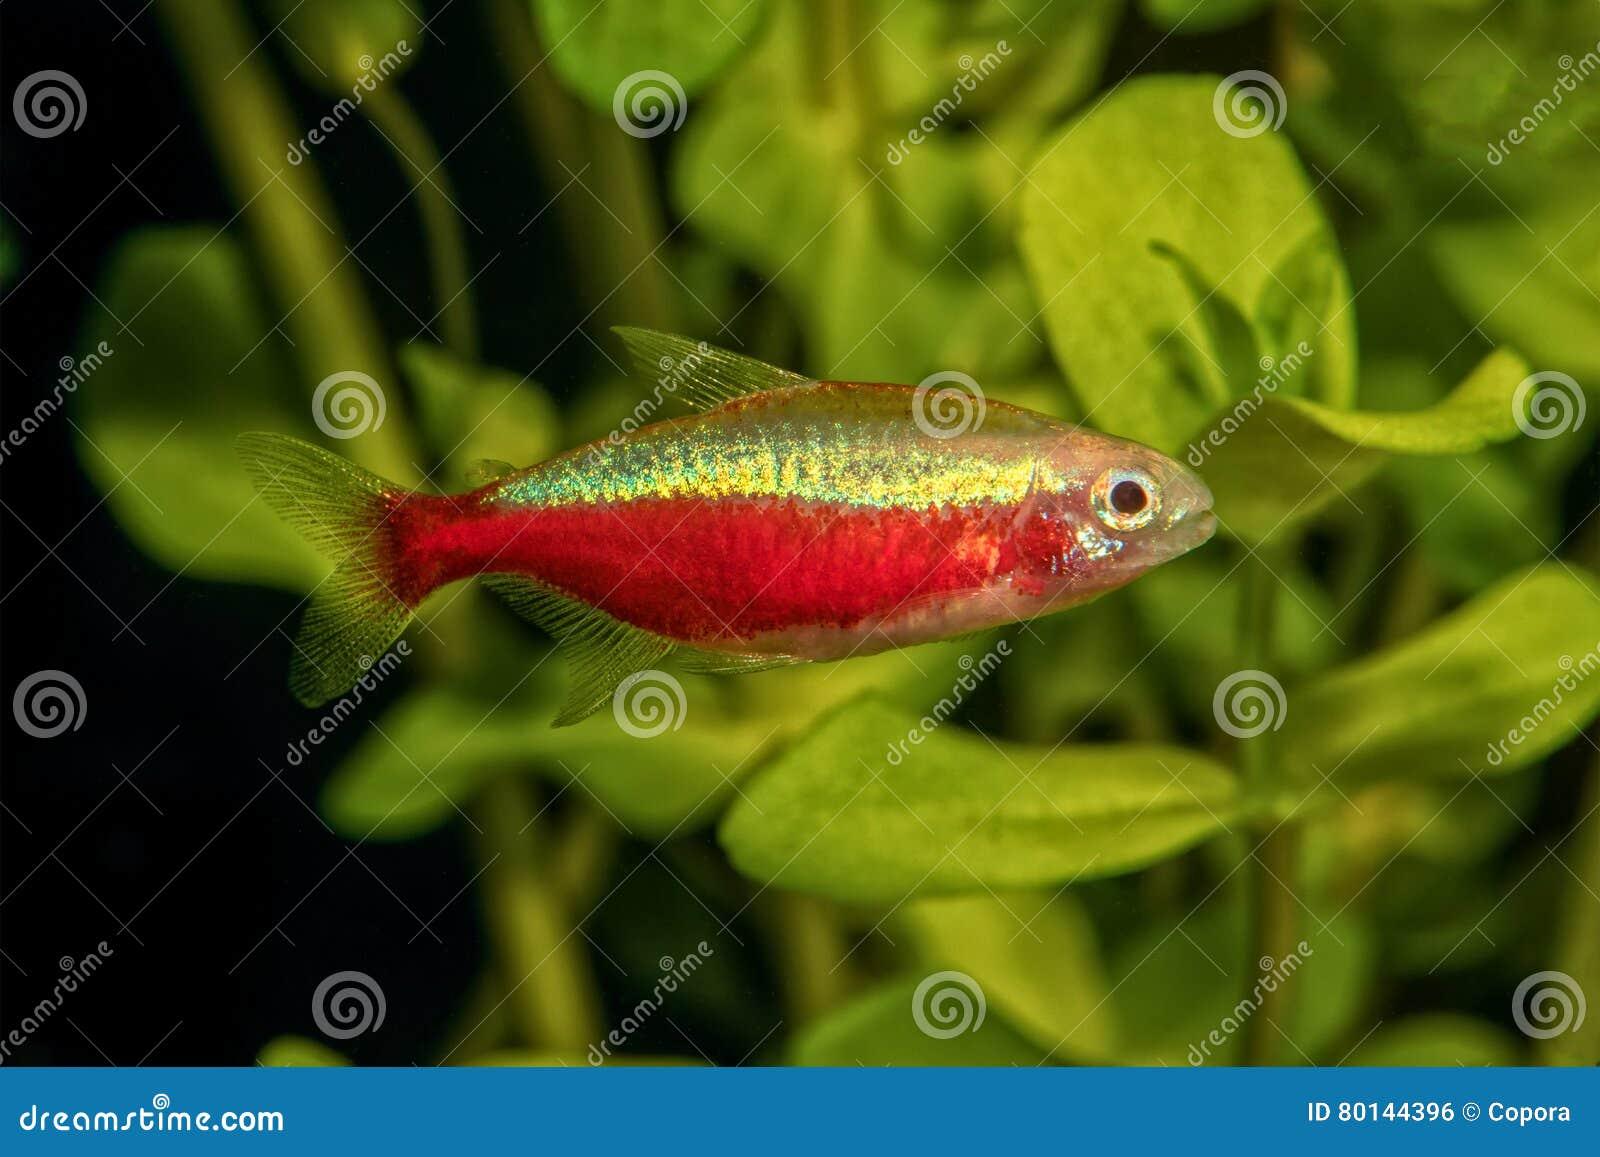 Portrait Of Neon Tetra Fish (Paracheirodon Axelrodi) In Aquarium ...